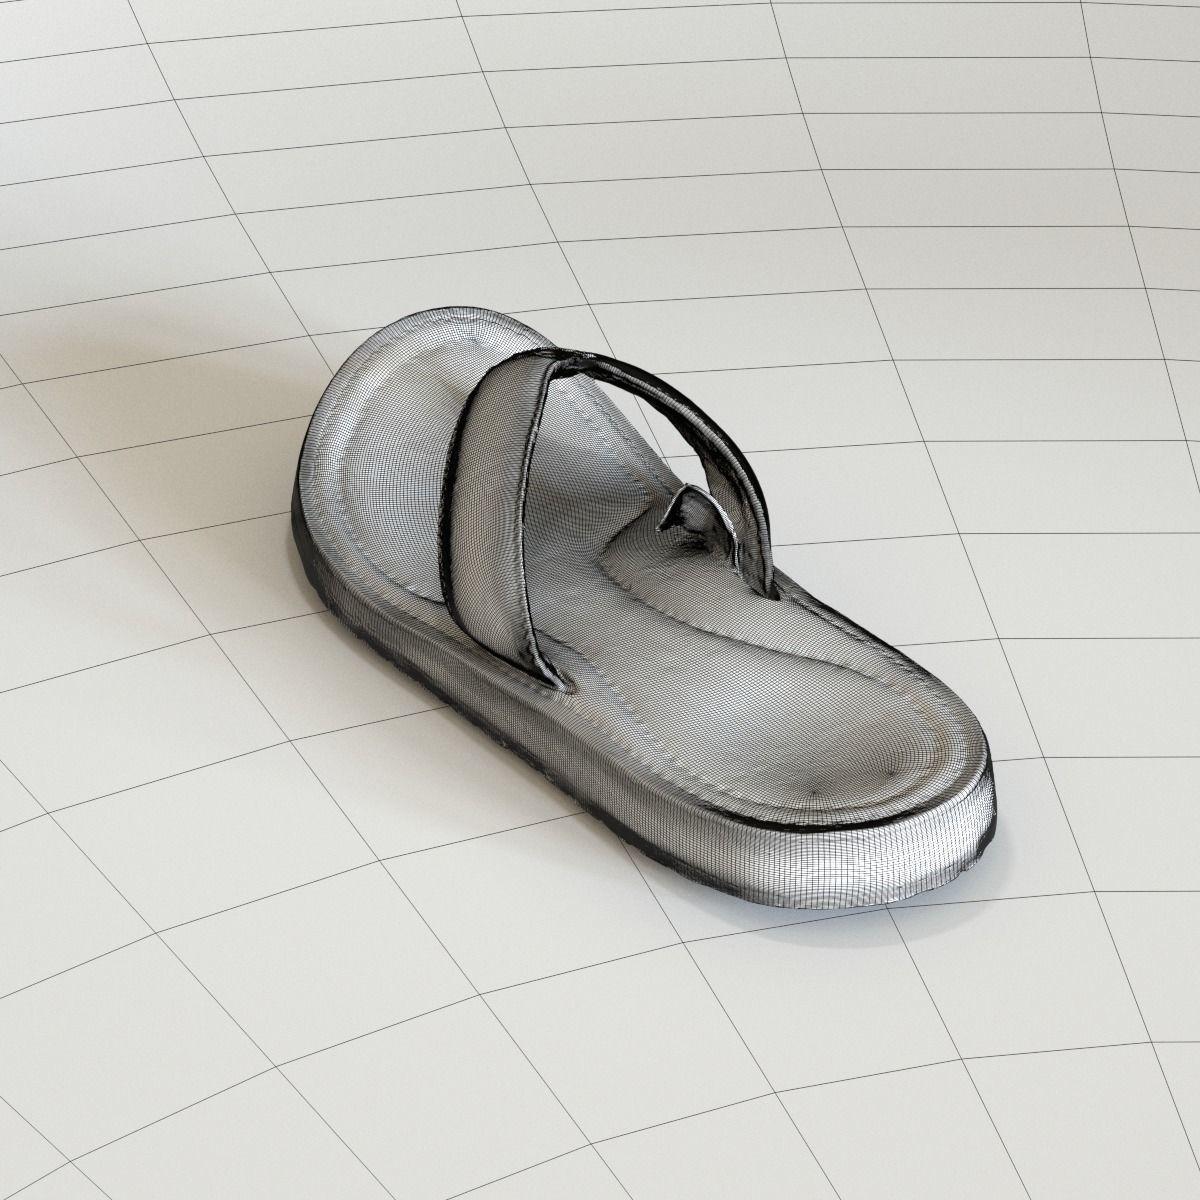 e3a4a0c278452e ... old teva sandal 3d model max fbx c4d ma mb 4 ...